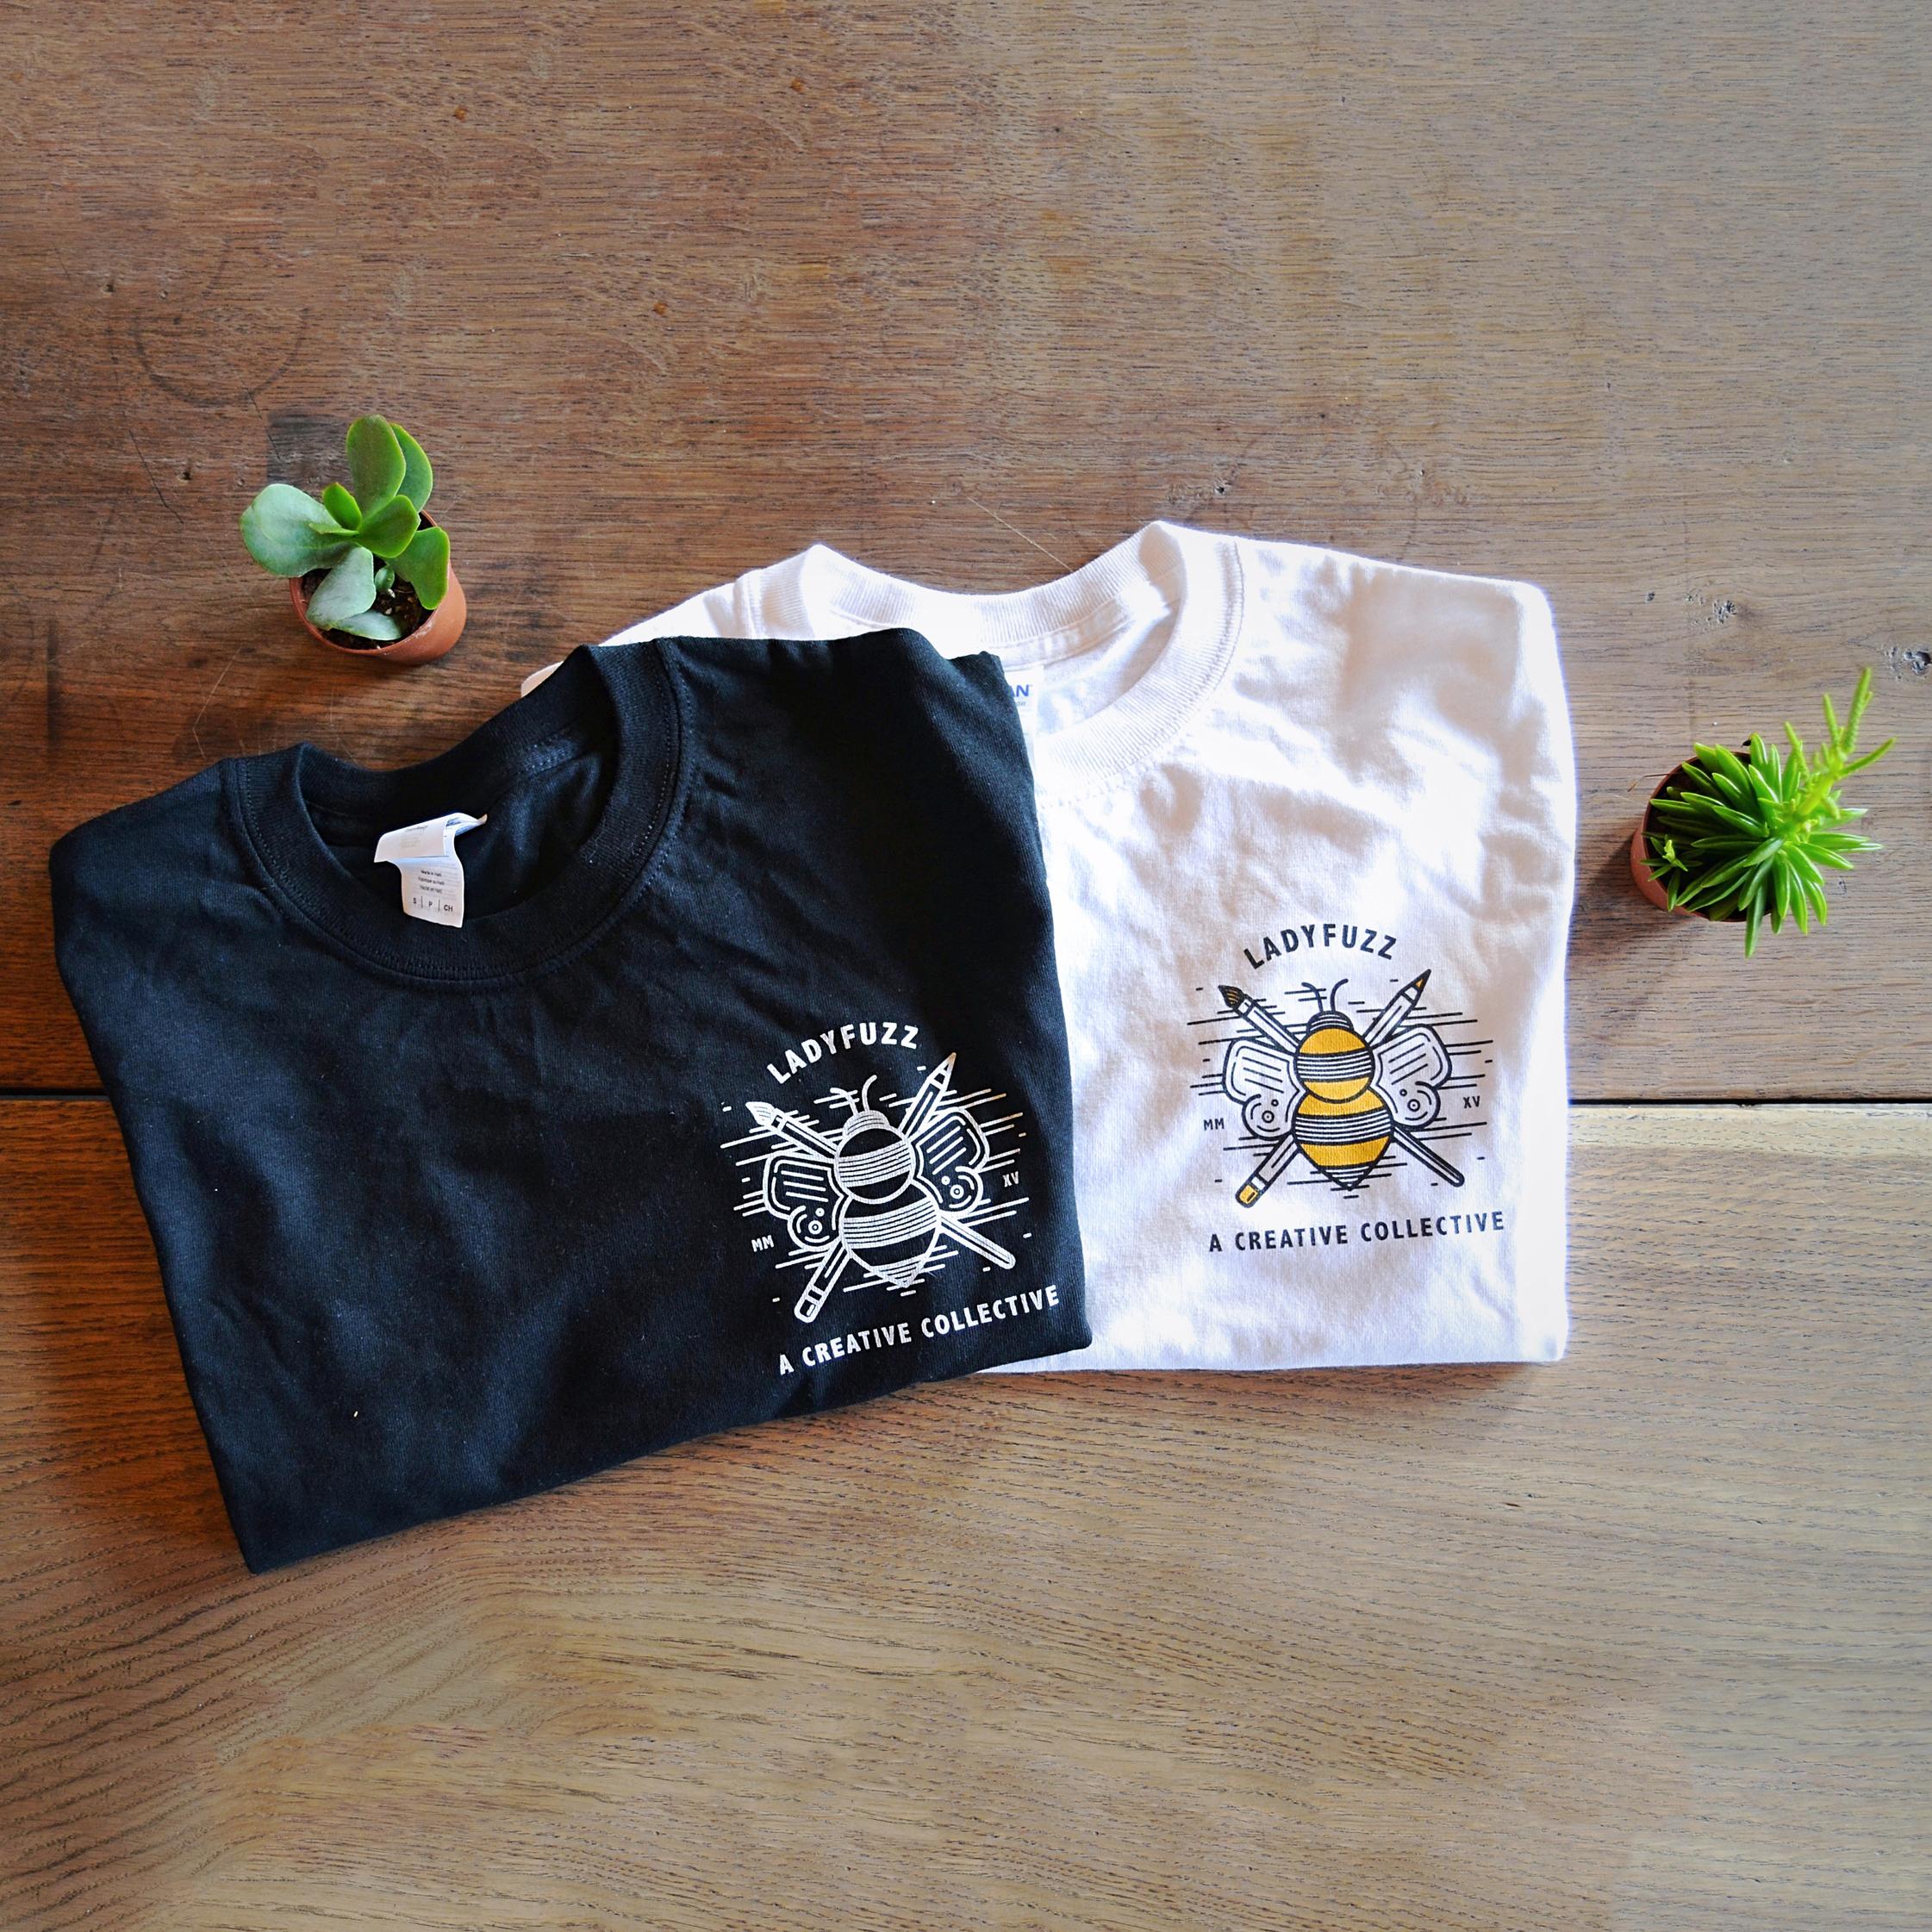 Ladyfuzz Creative Collective T-Shirt